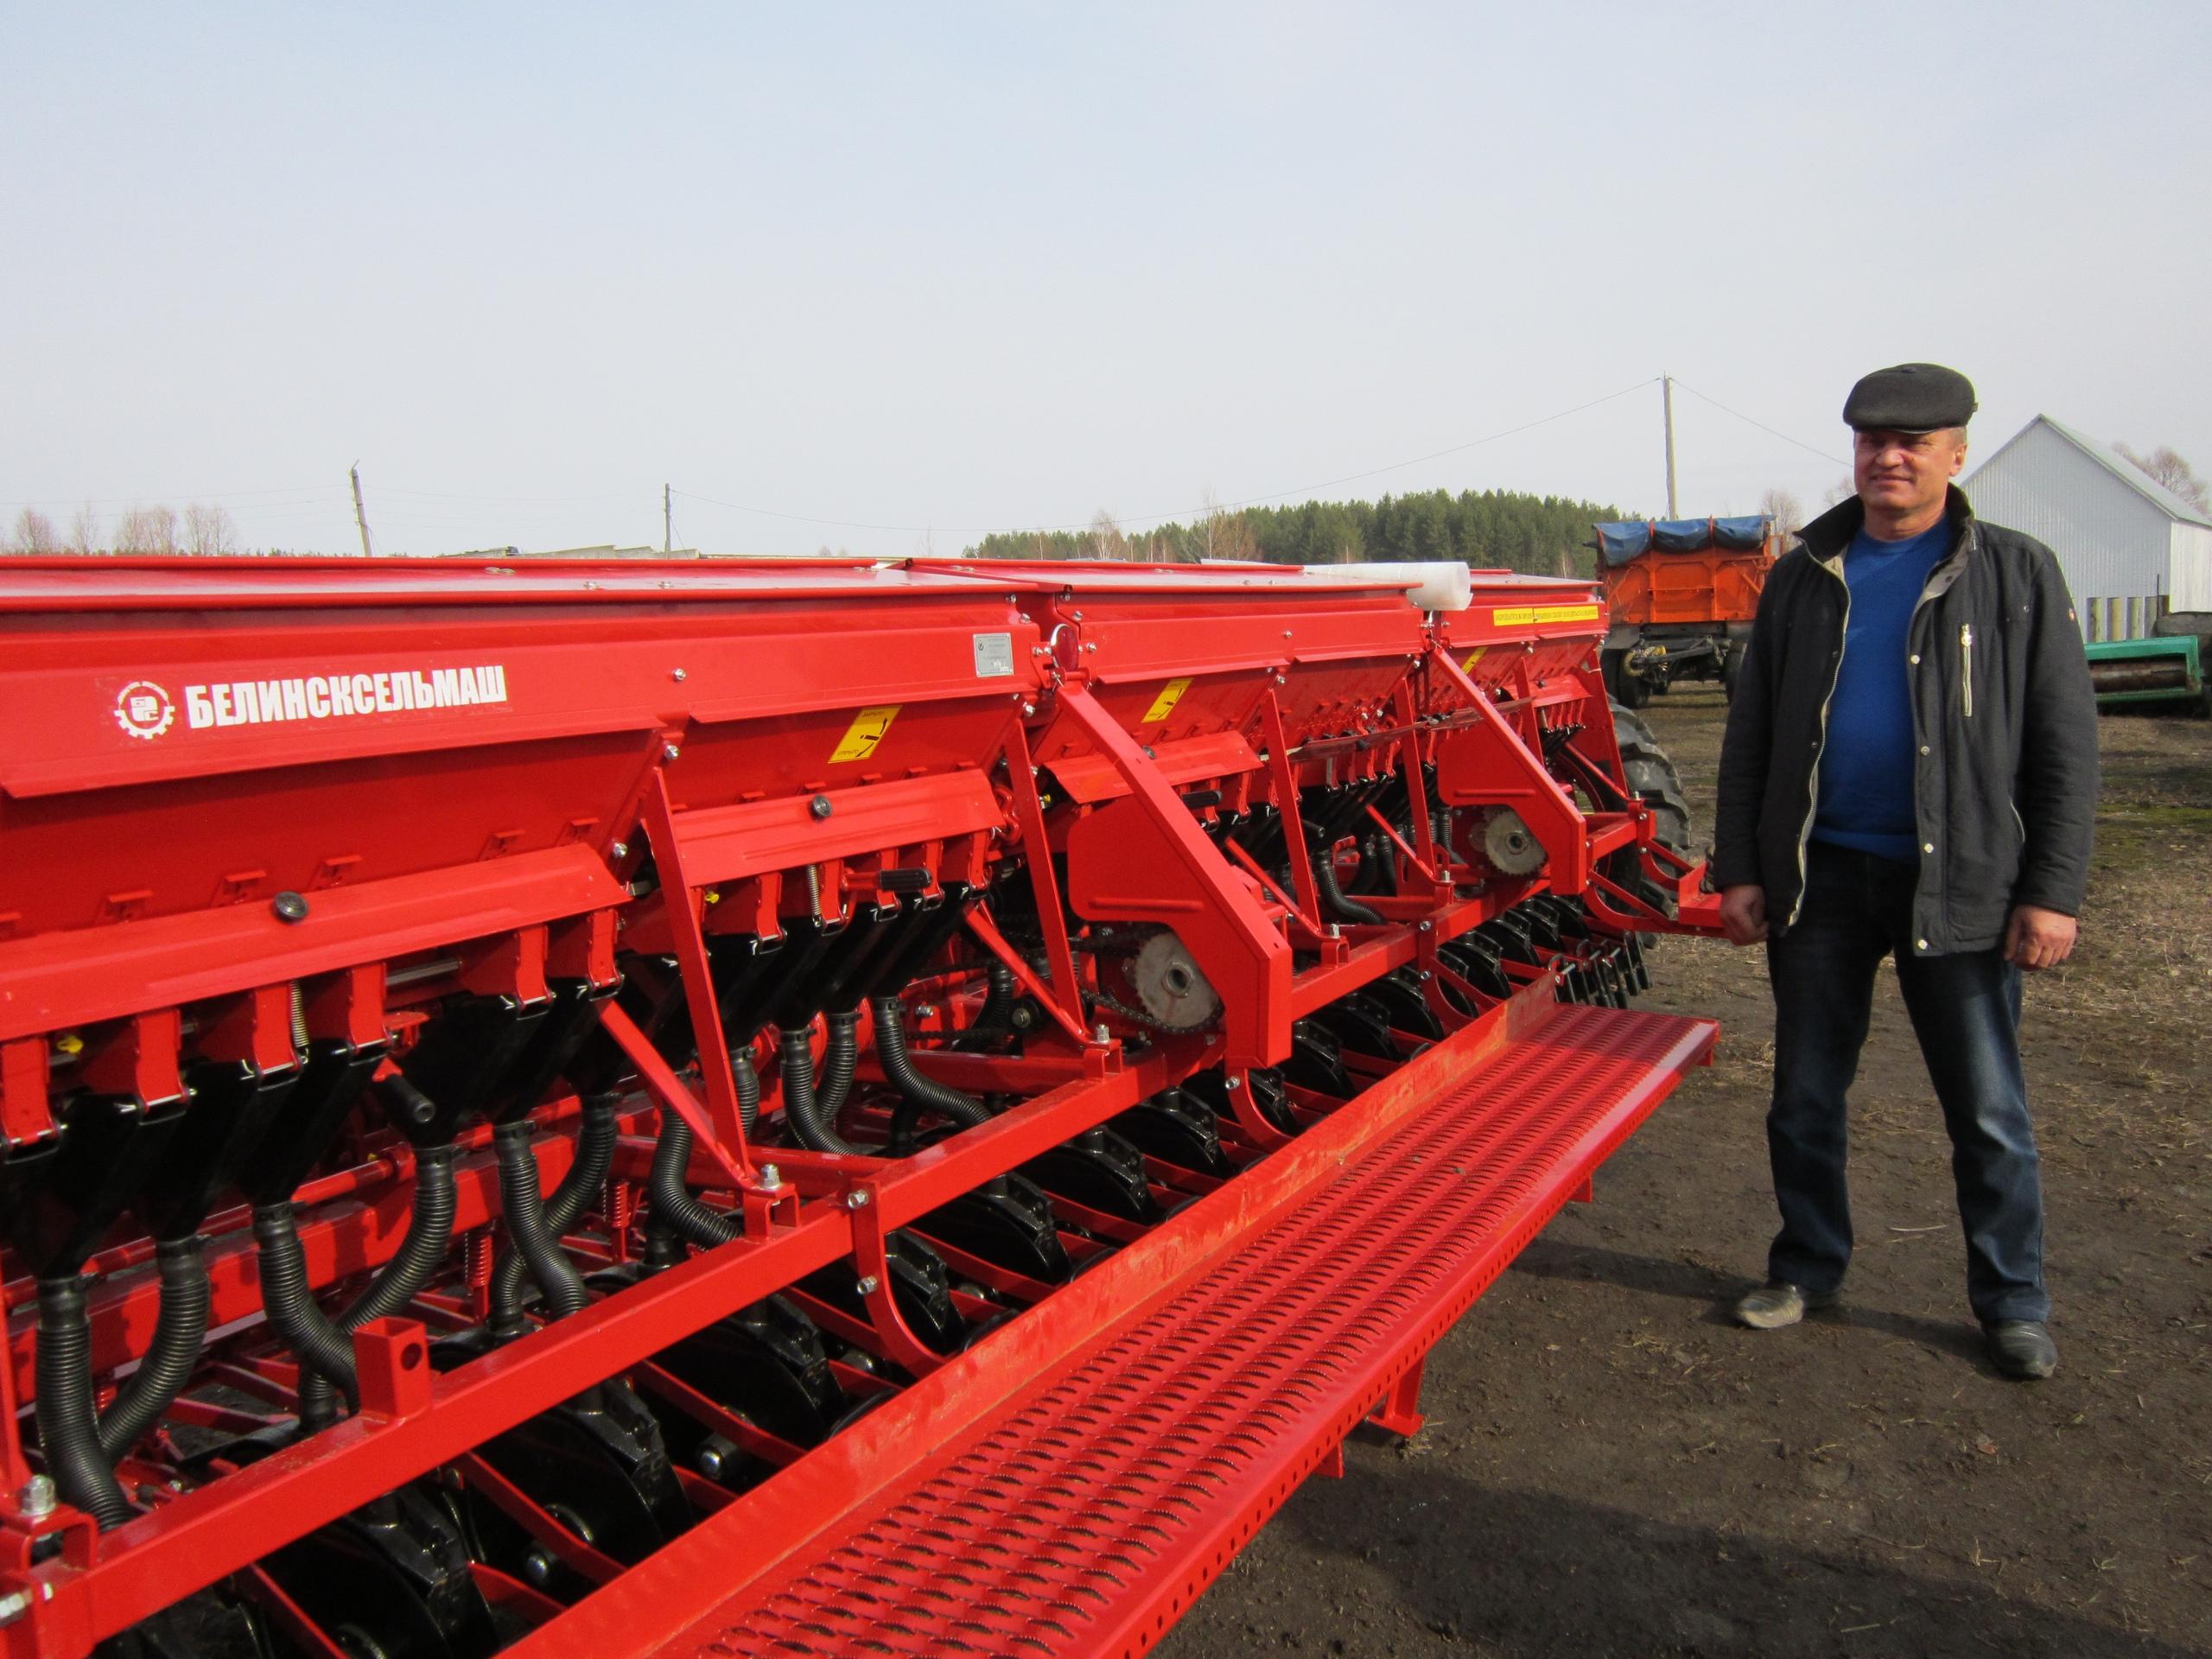 Фермерэнь хозяйствань азорось – СЕРГЕЙ КИПАЕВ